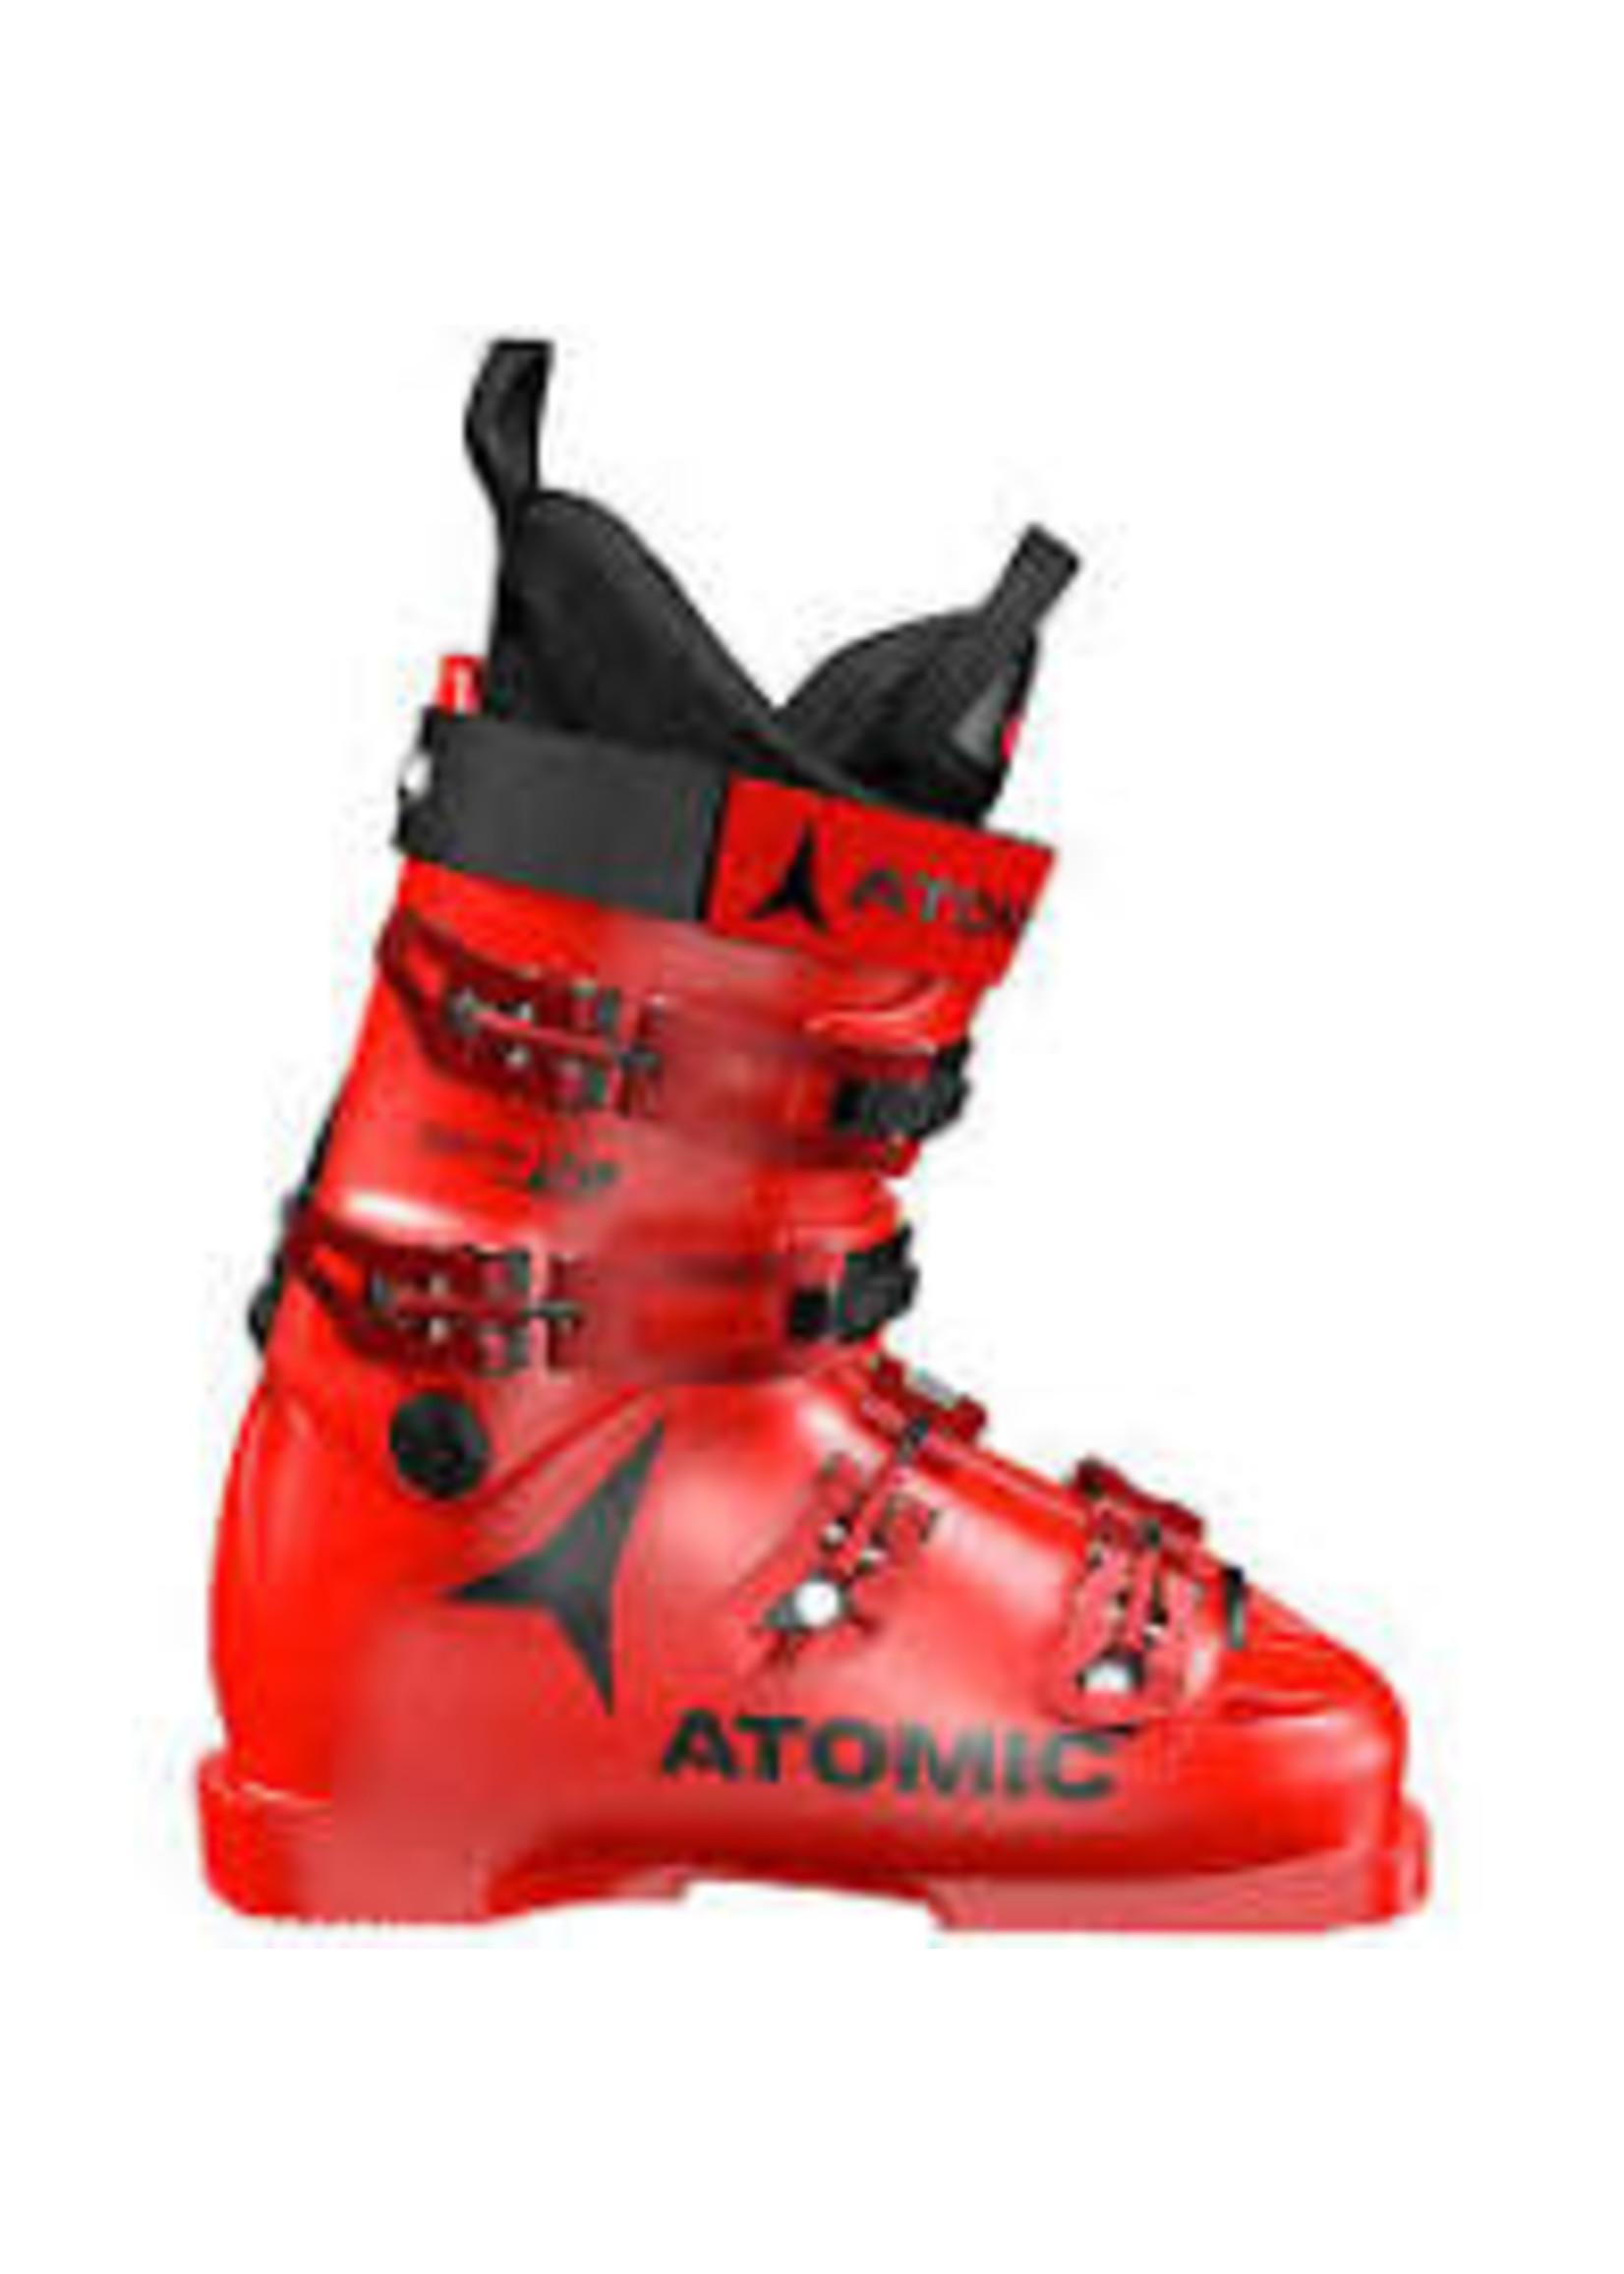 Atomic Red CS 90 LC